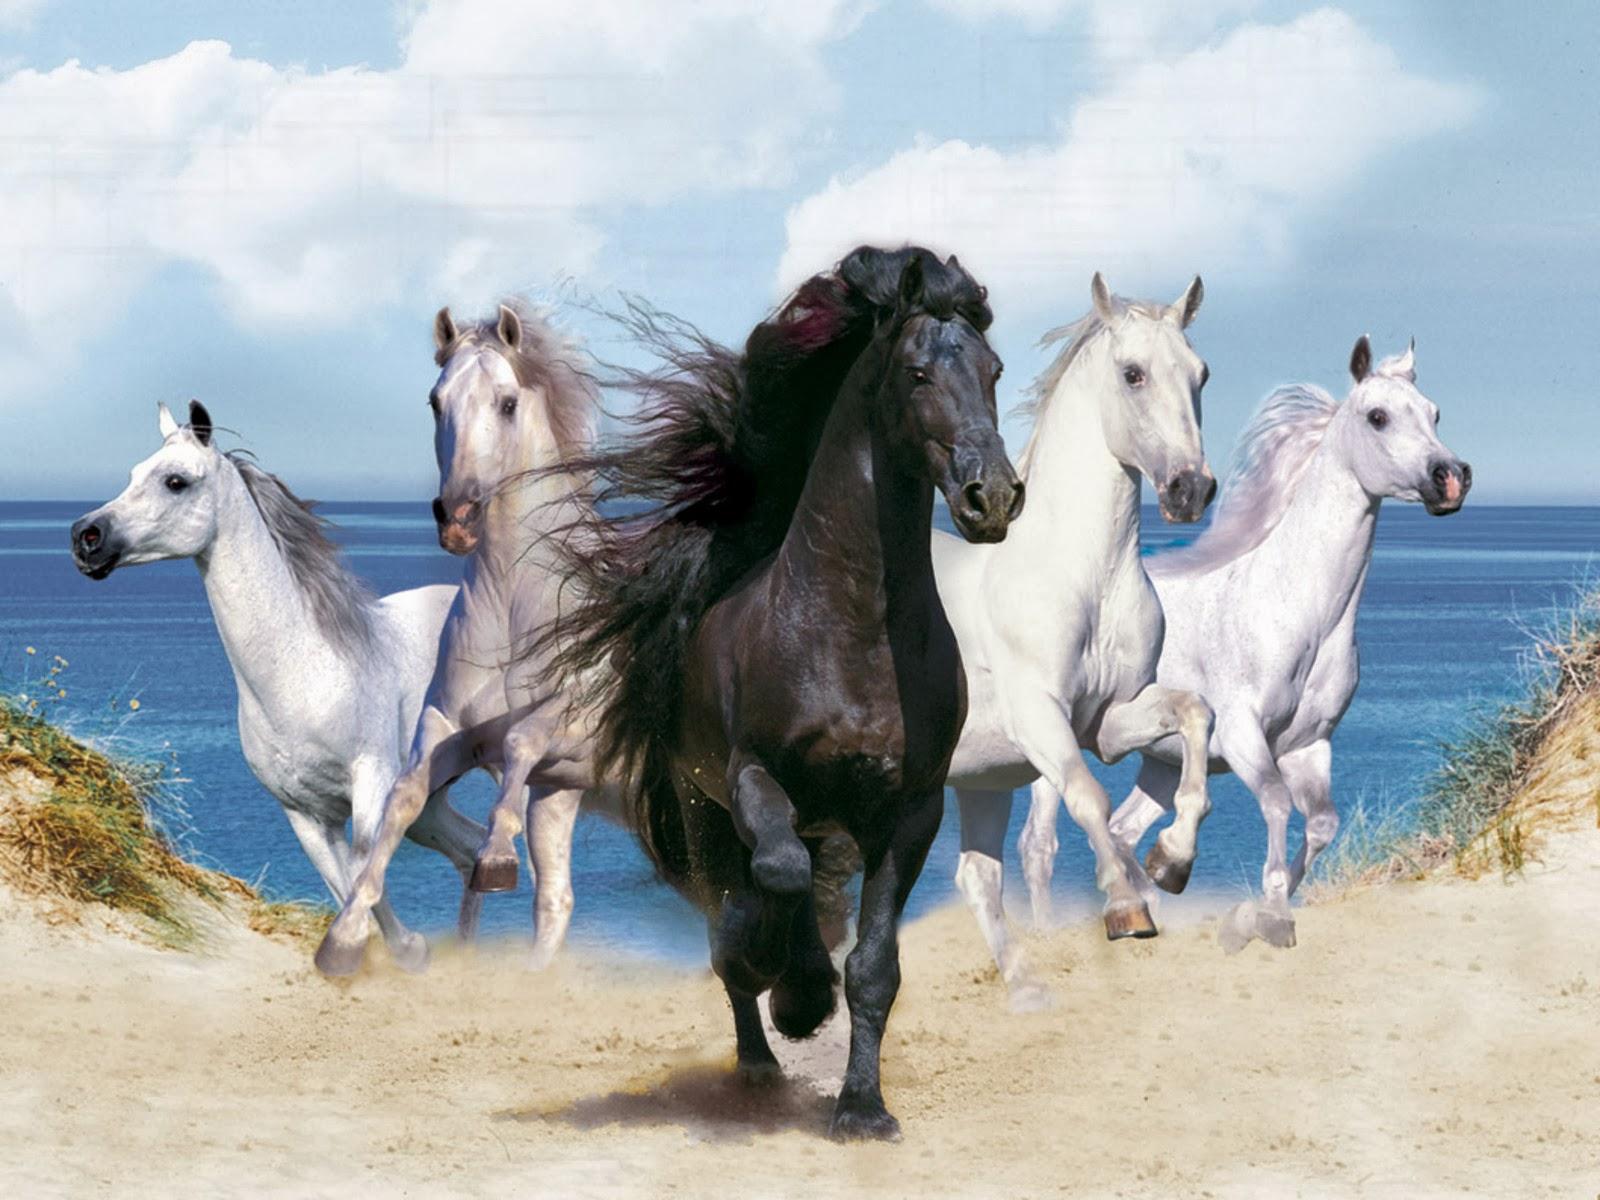 Running Horses Horse Hd Beautiful Cool Wallpaper White And Black Horses 1600x1200 Wallpaper Teahub Io